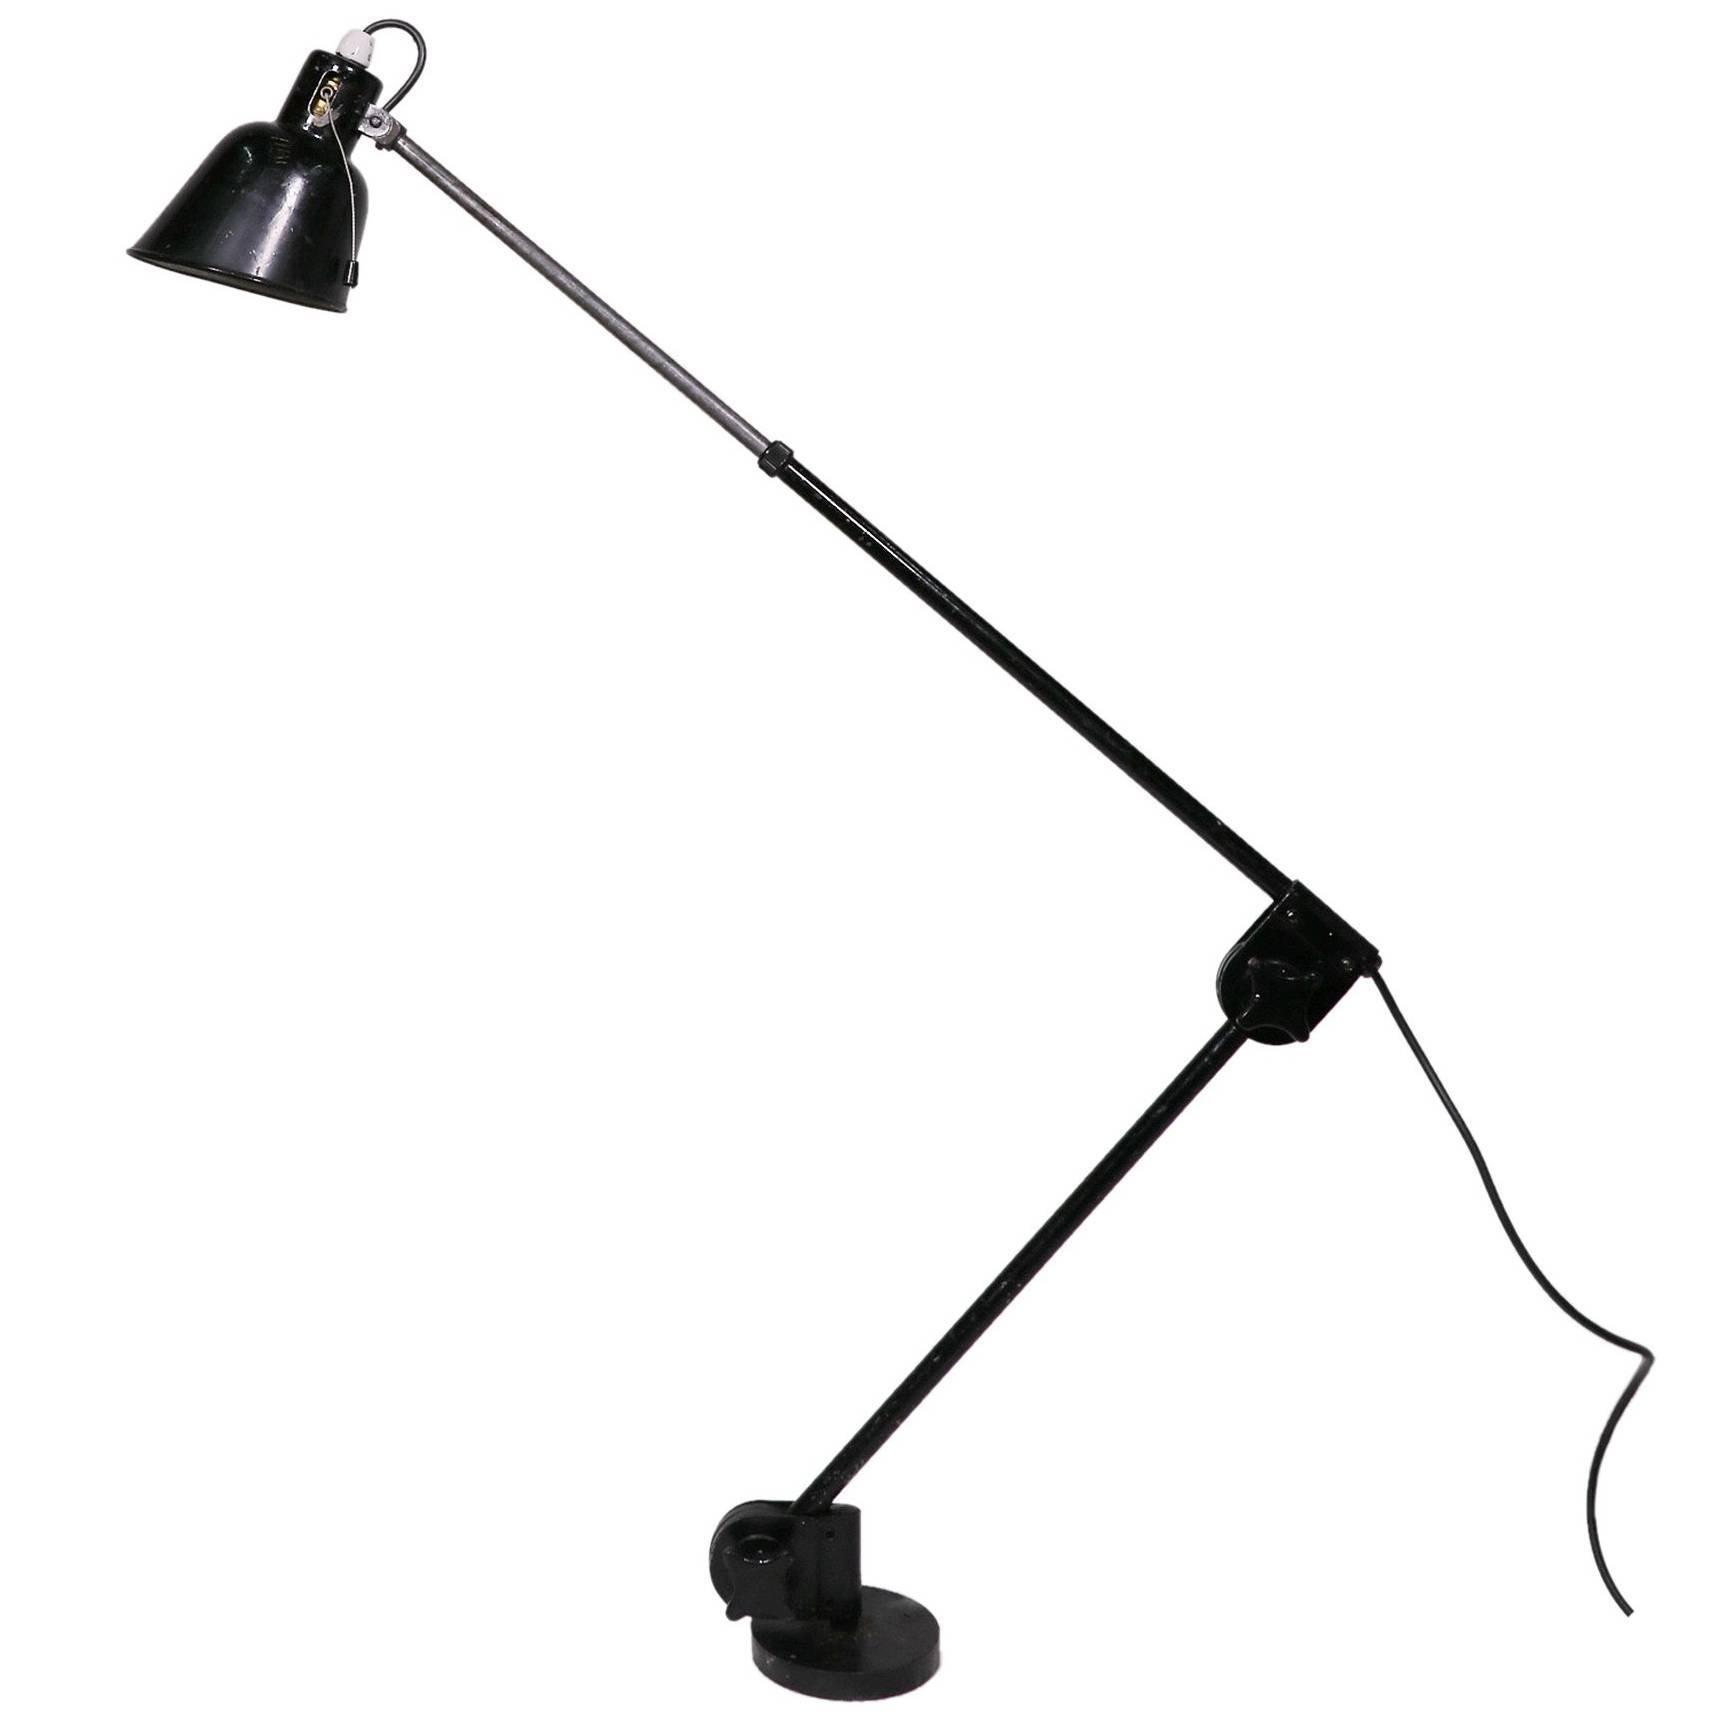 Vintage Industrial Adjustable Articulated Telescopic Task Lamp